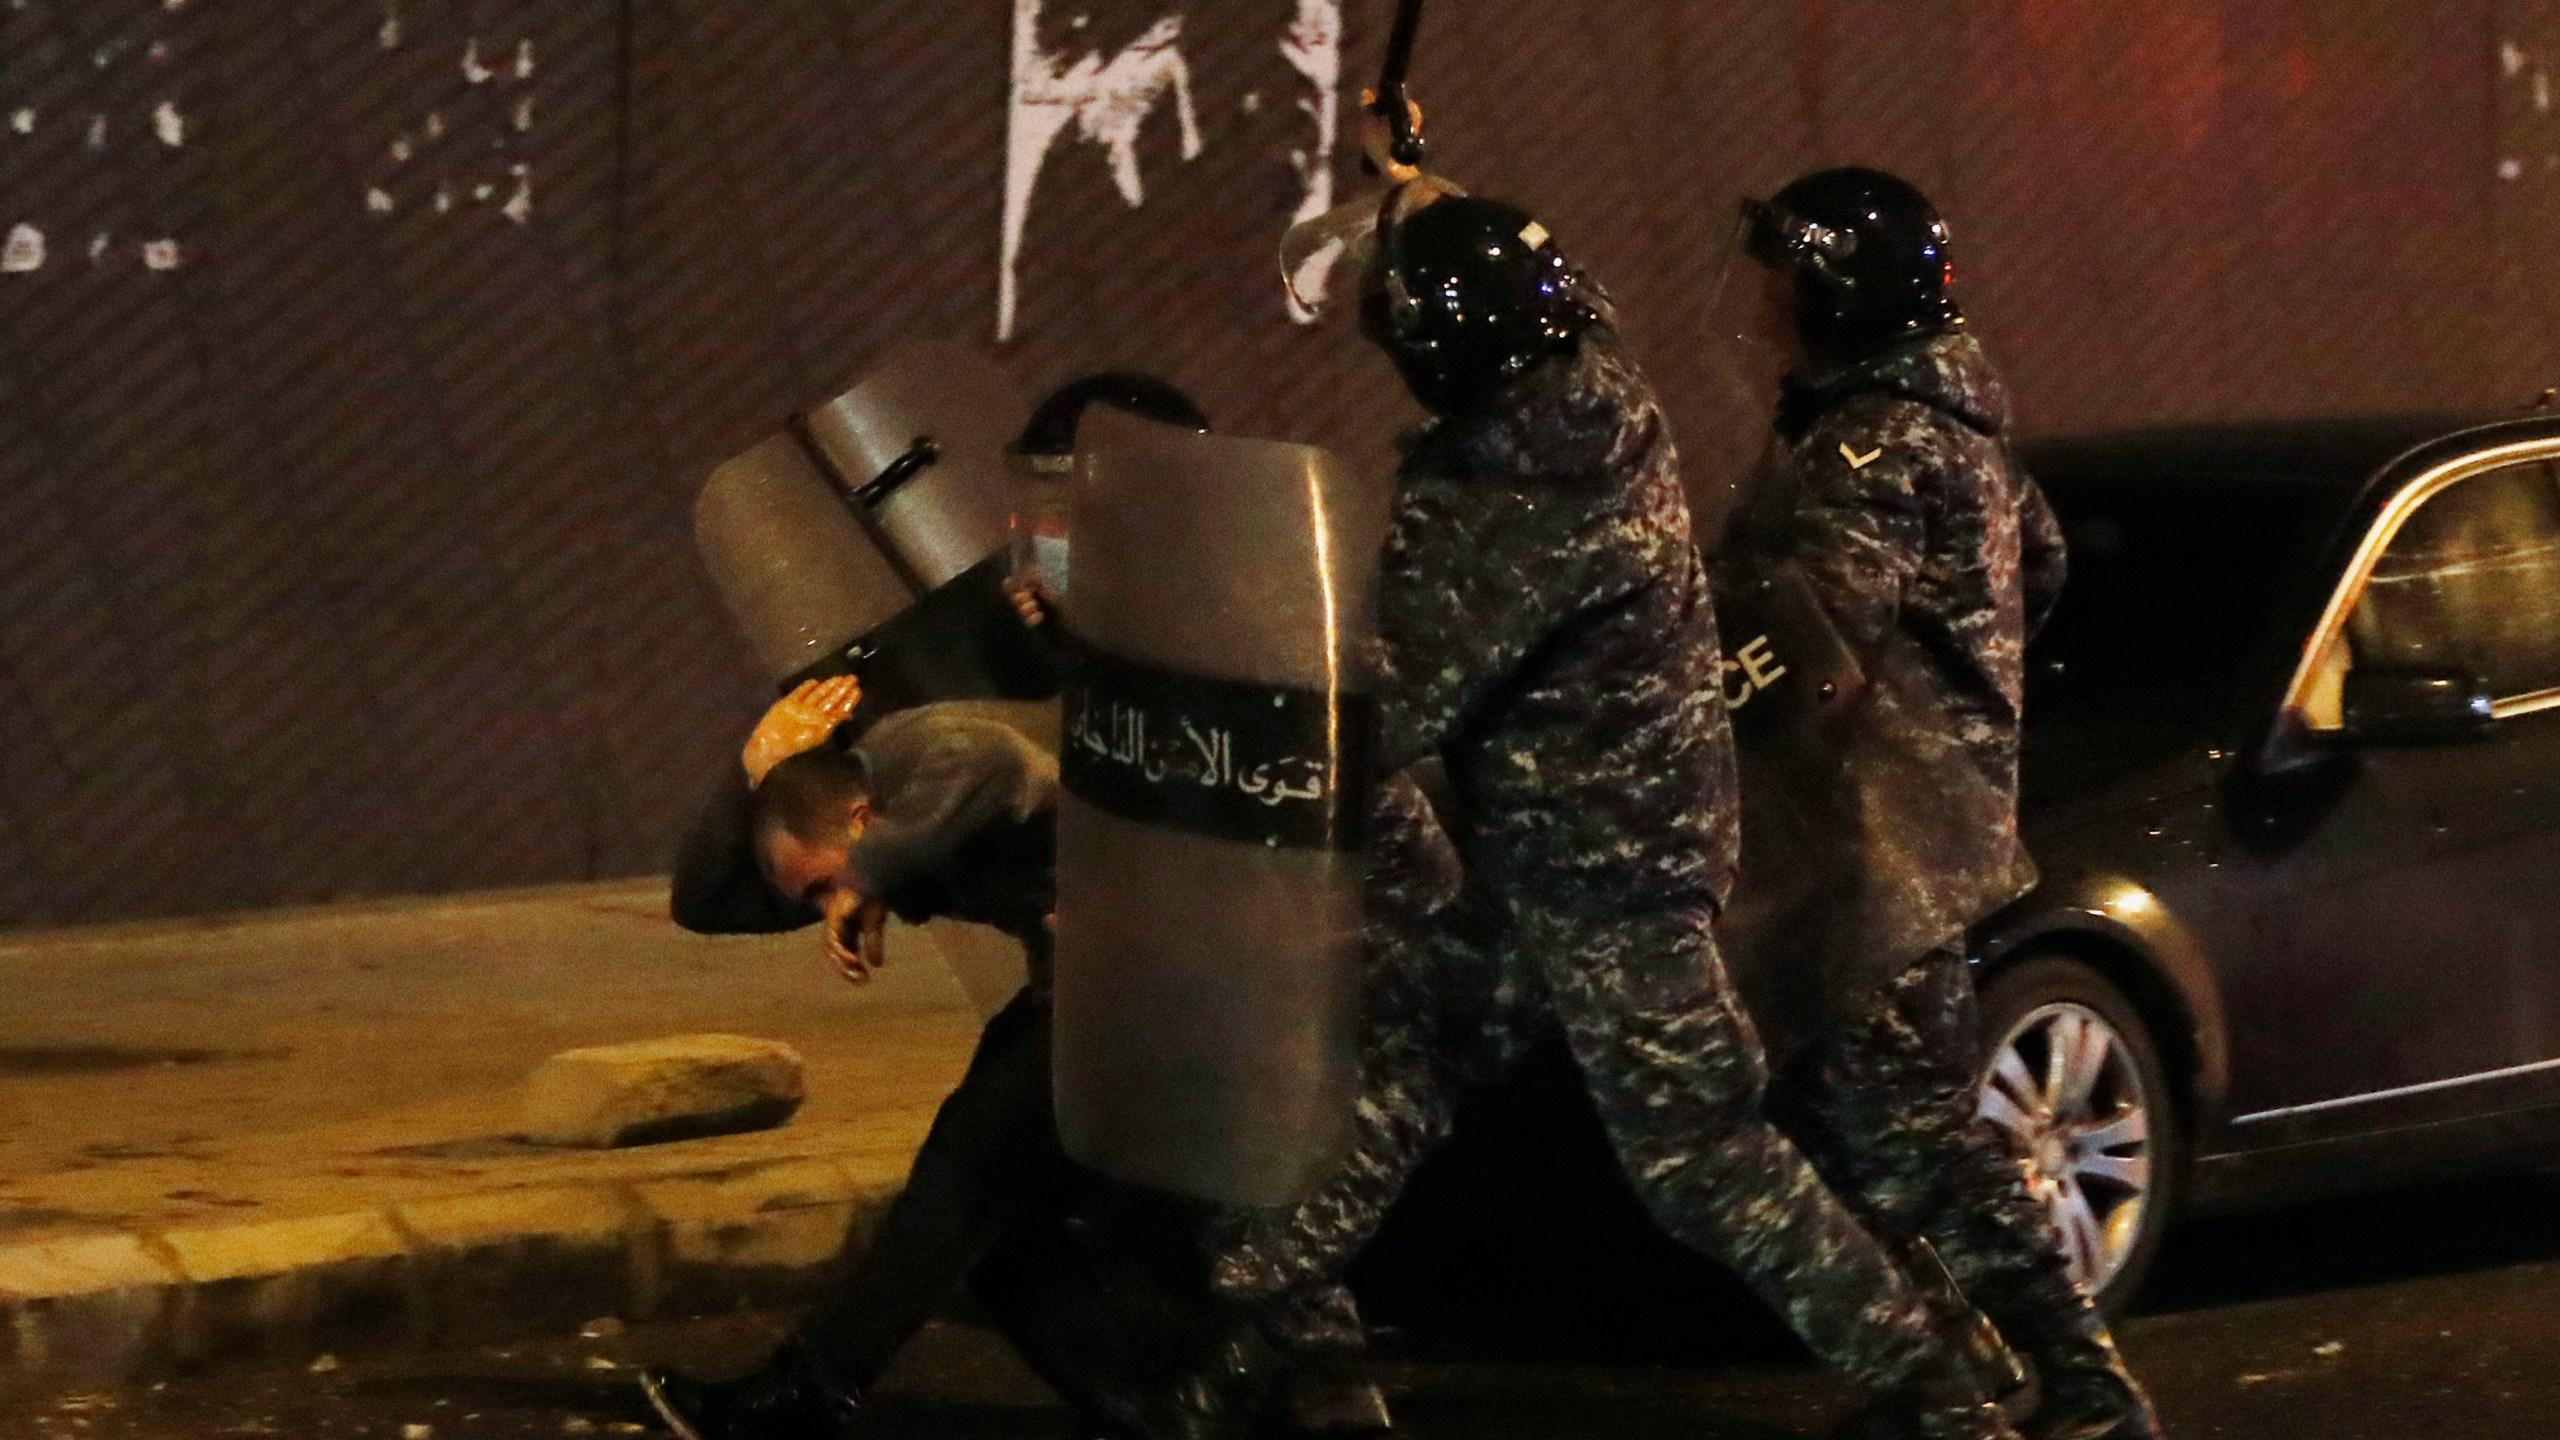 Картинки по запросу Lebanon protests roll into second day amid police crackdown